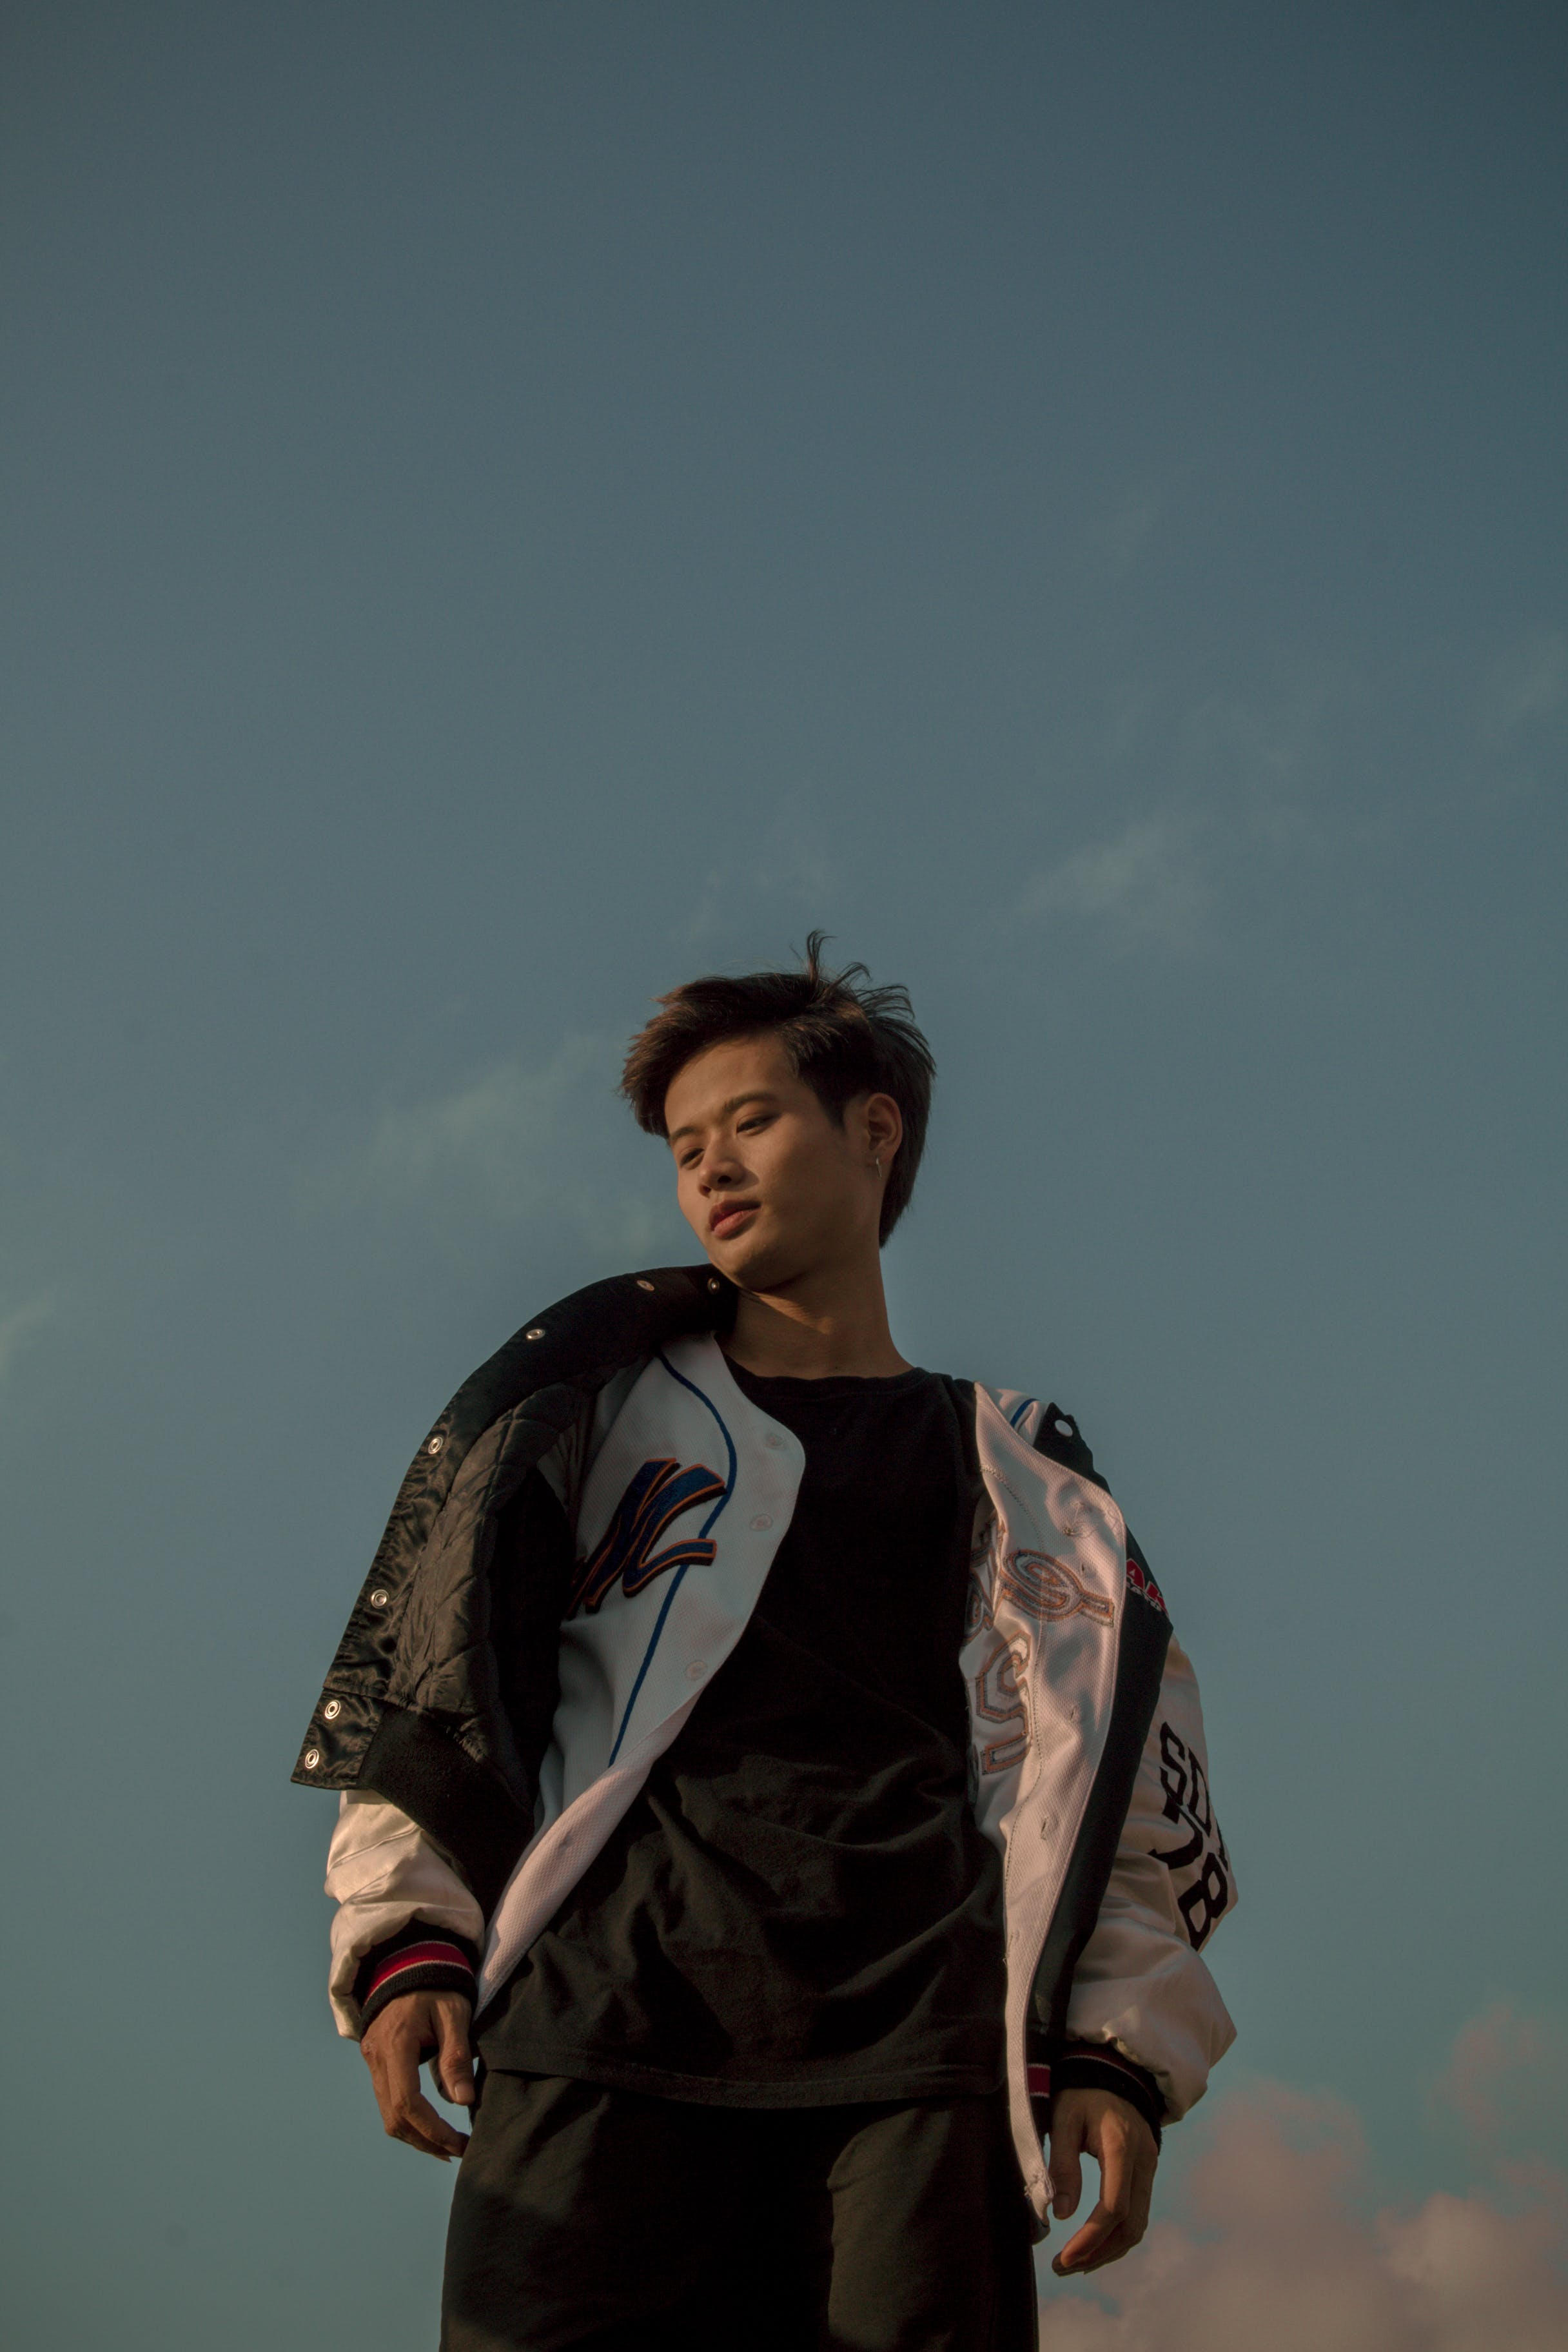 Gratis stockfoto met aziatische kerel, Aziatische persoon, fashion, fashion model